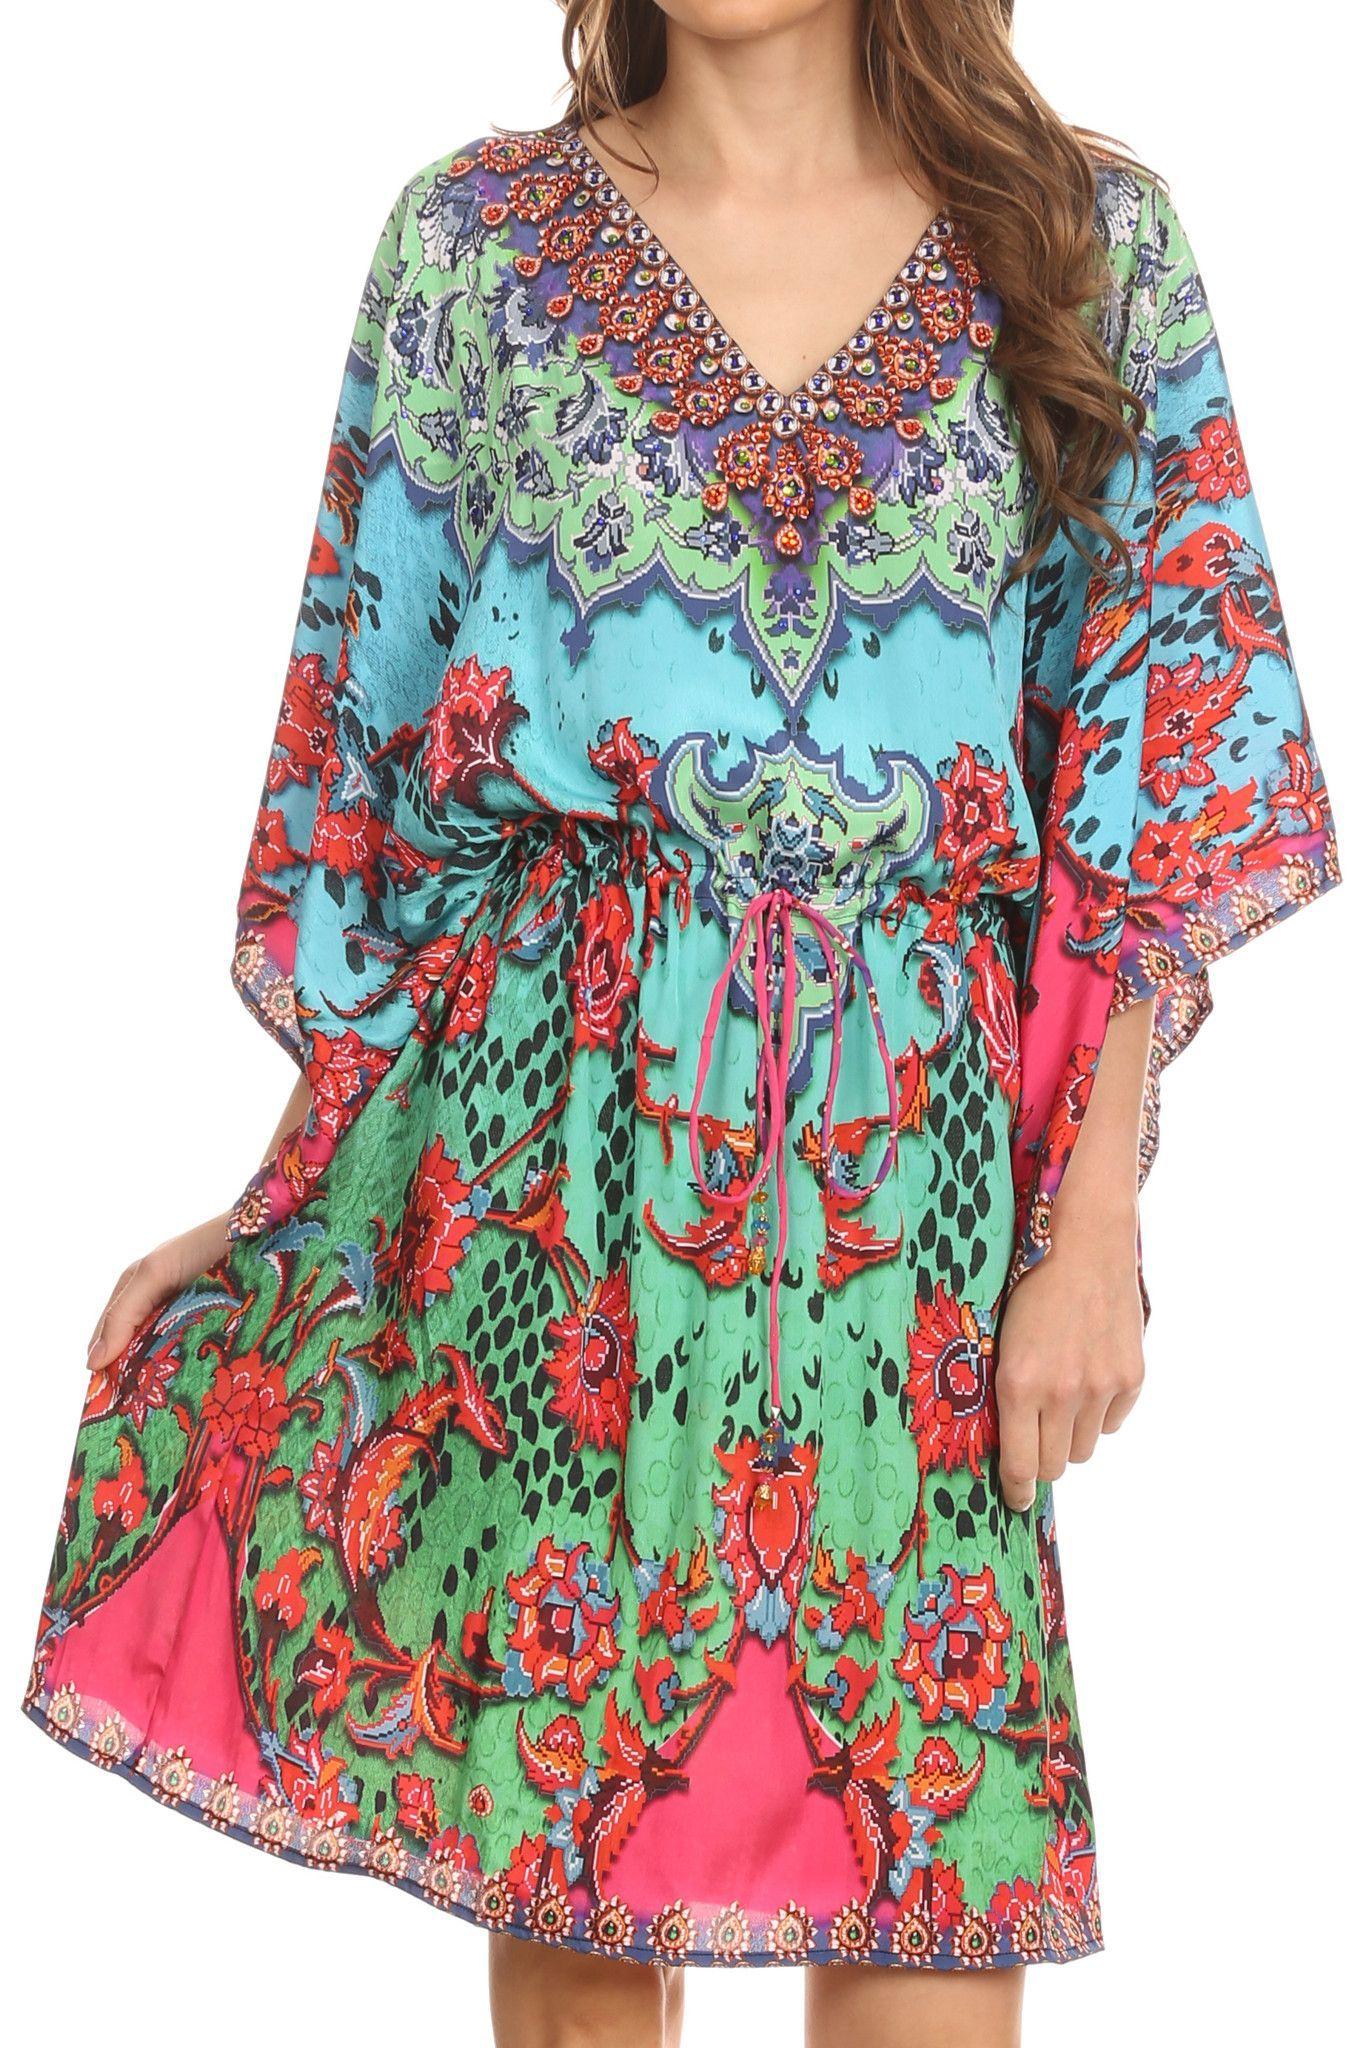 Recycled Fabric Elegant Dress Tunica Dress Night Wear Long Gown Hippie Kaftan Trendy Fashion Beach Wear Evening Dress Autumn Dress #52